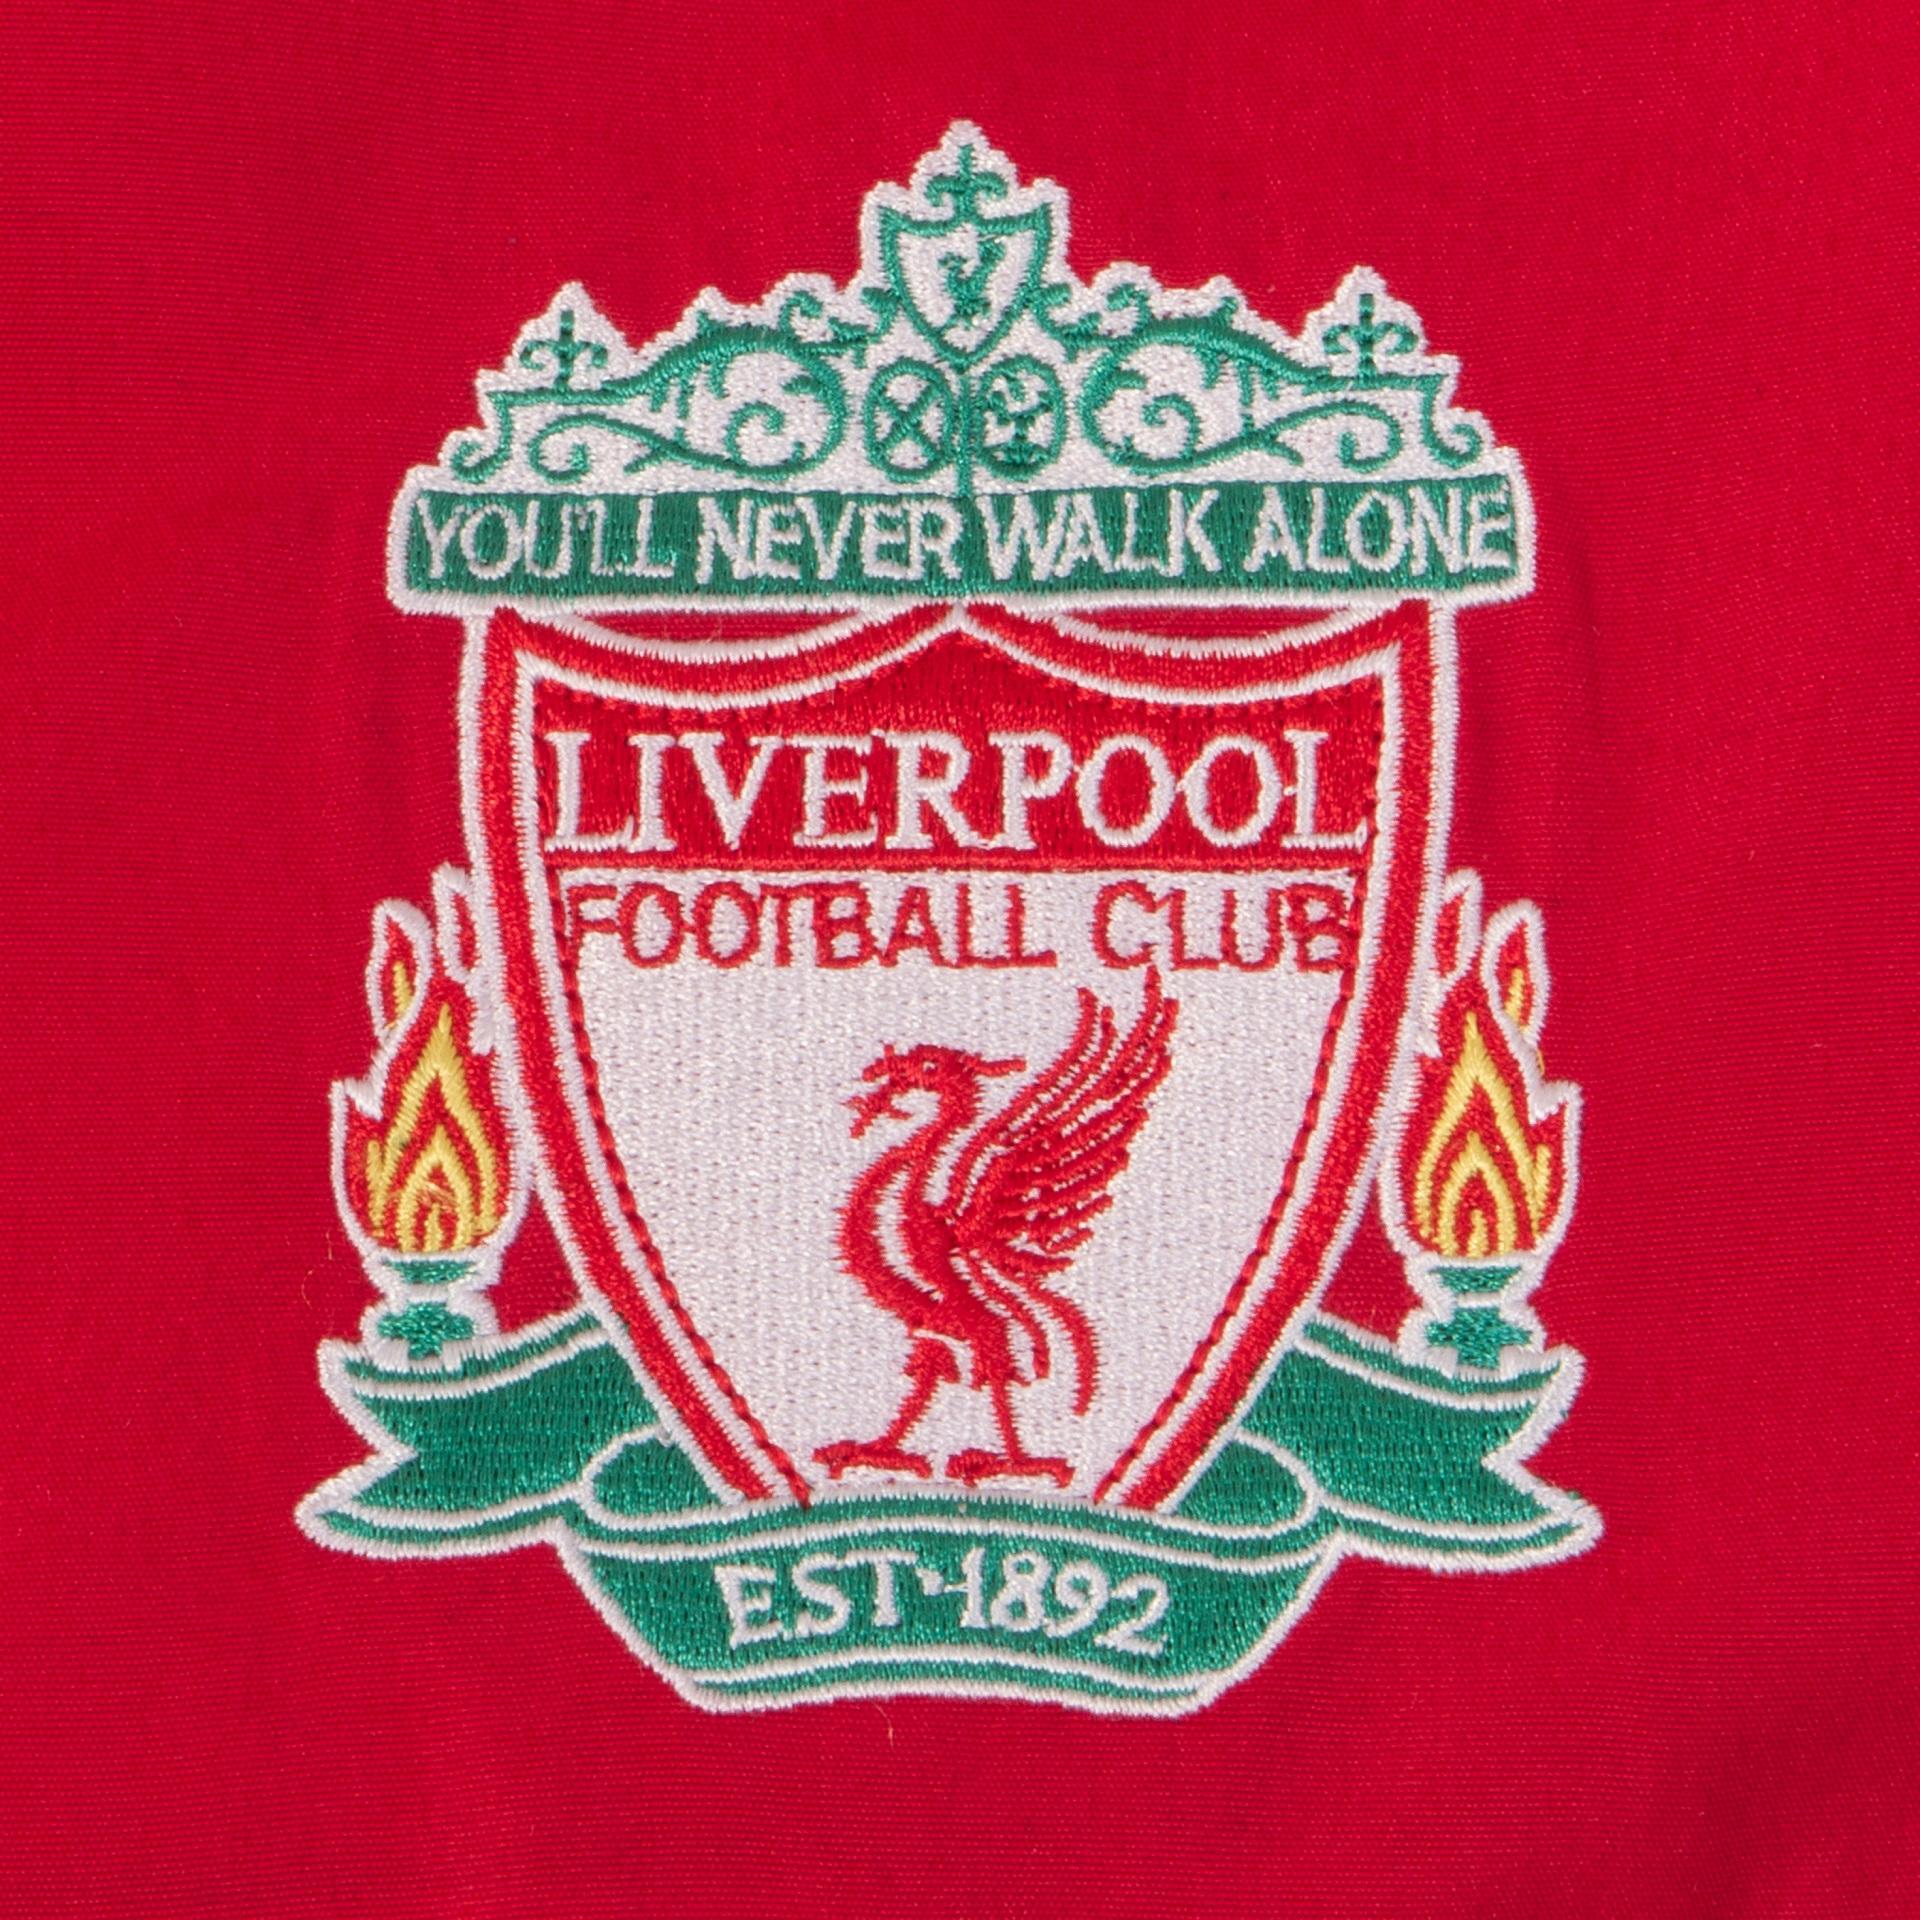 0d68db43f51c6 Liverpool FC - Chándal oficial para niño - Chaqueta y pantalón ...